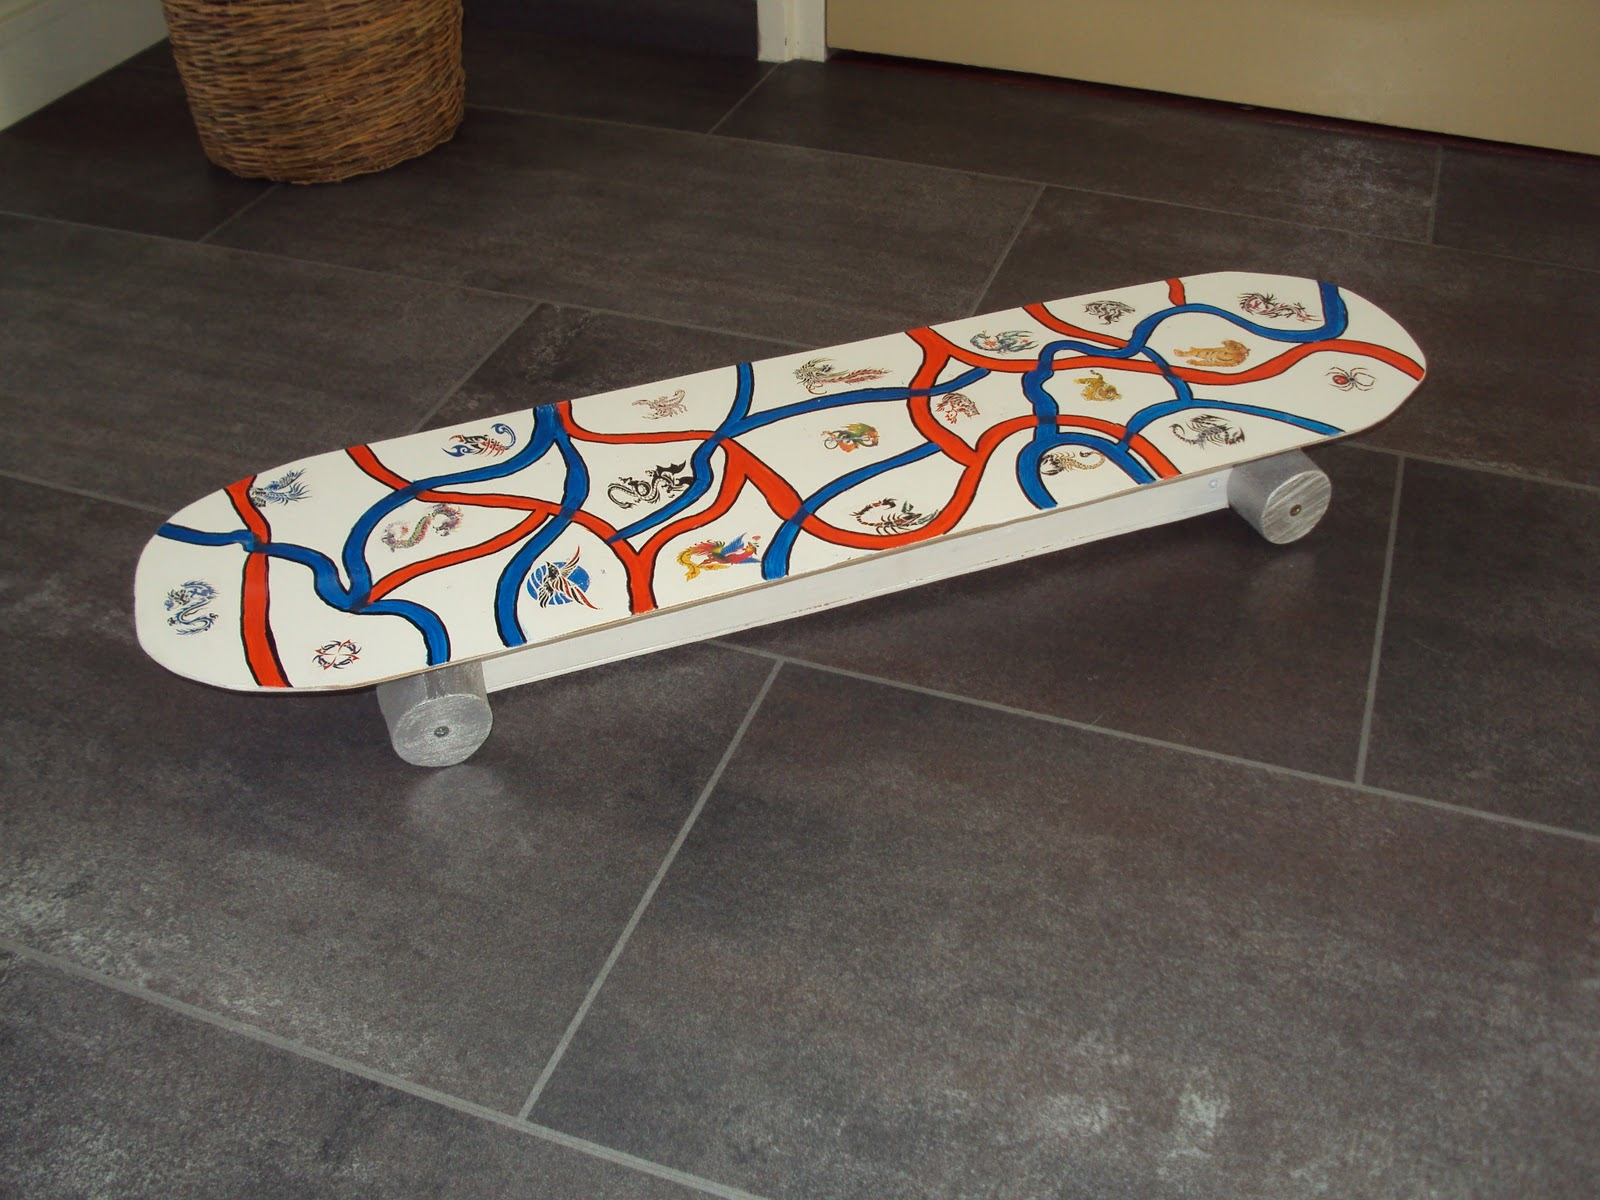 Skateboard surprise